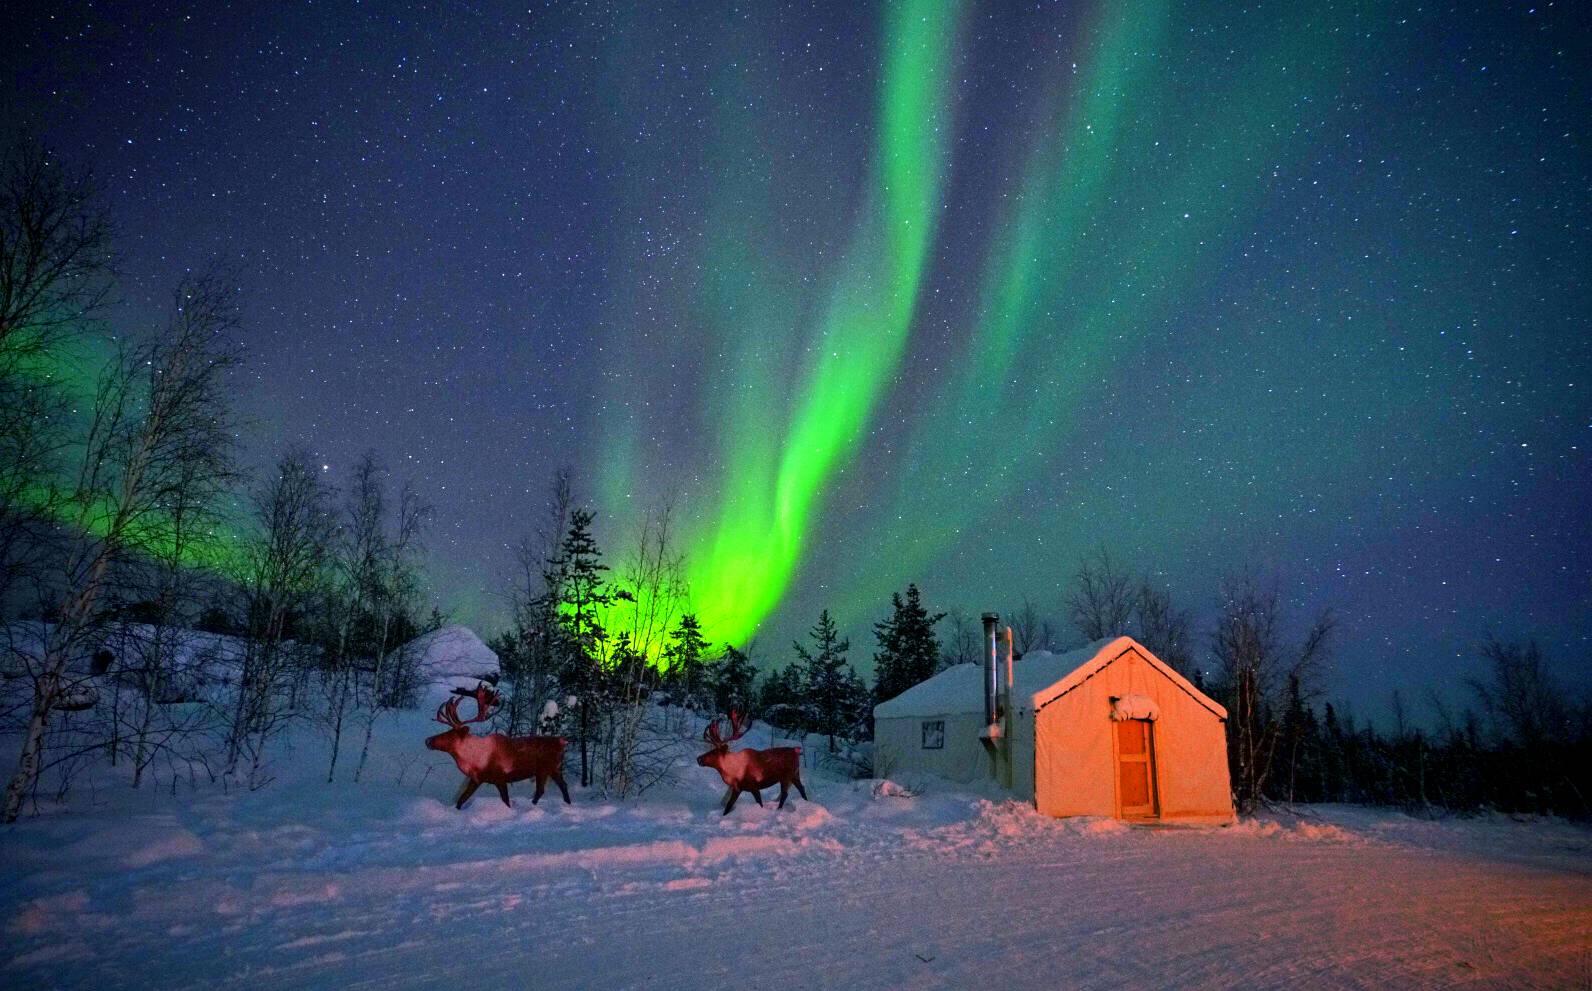 3-Day Yellowknife Aurora Viewing Tour